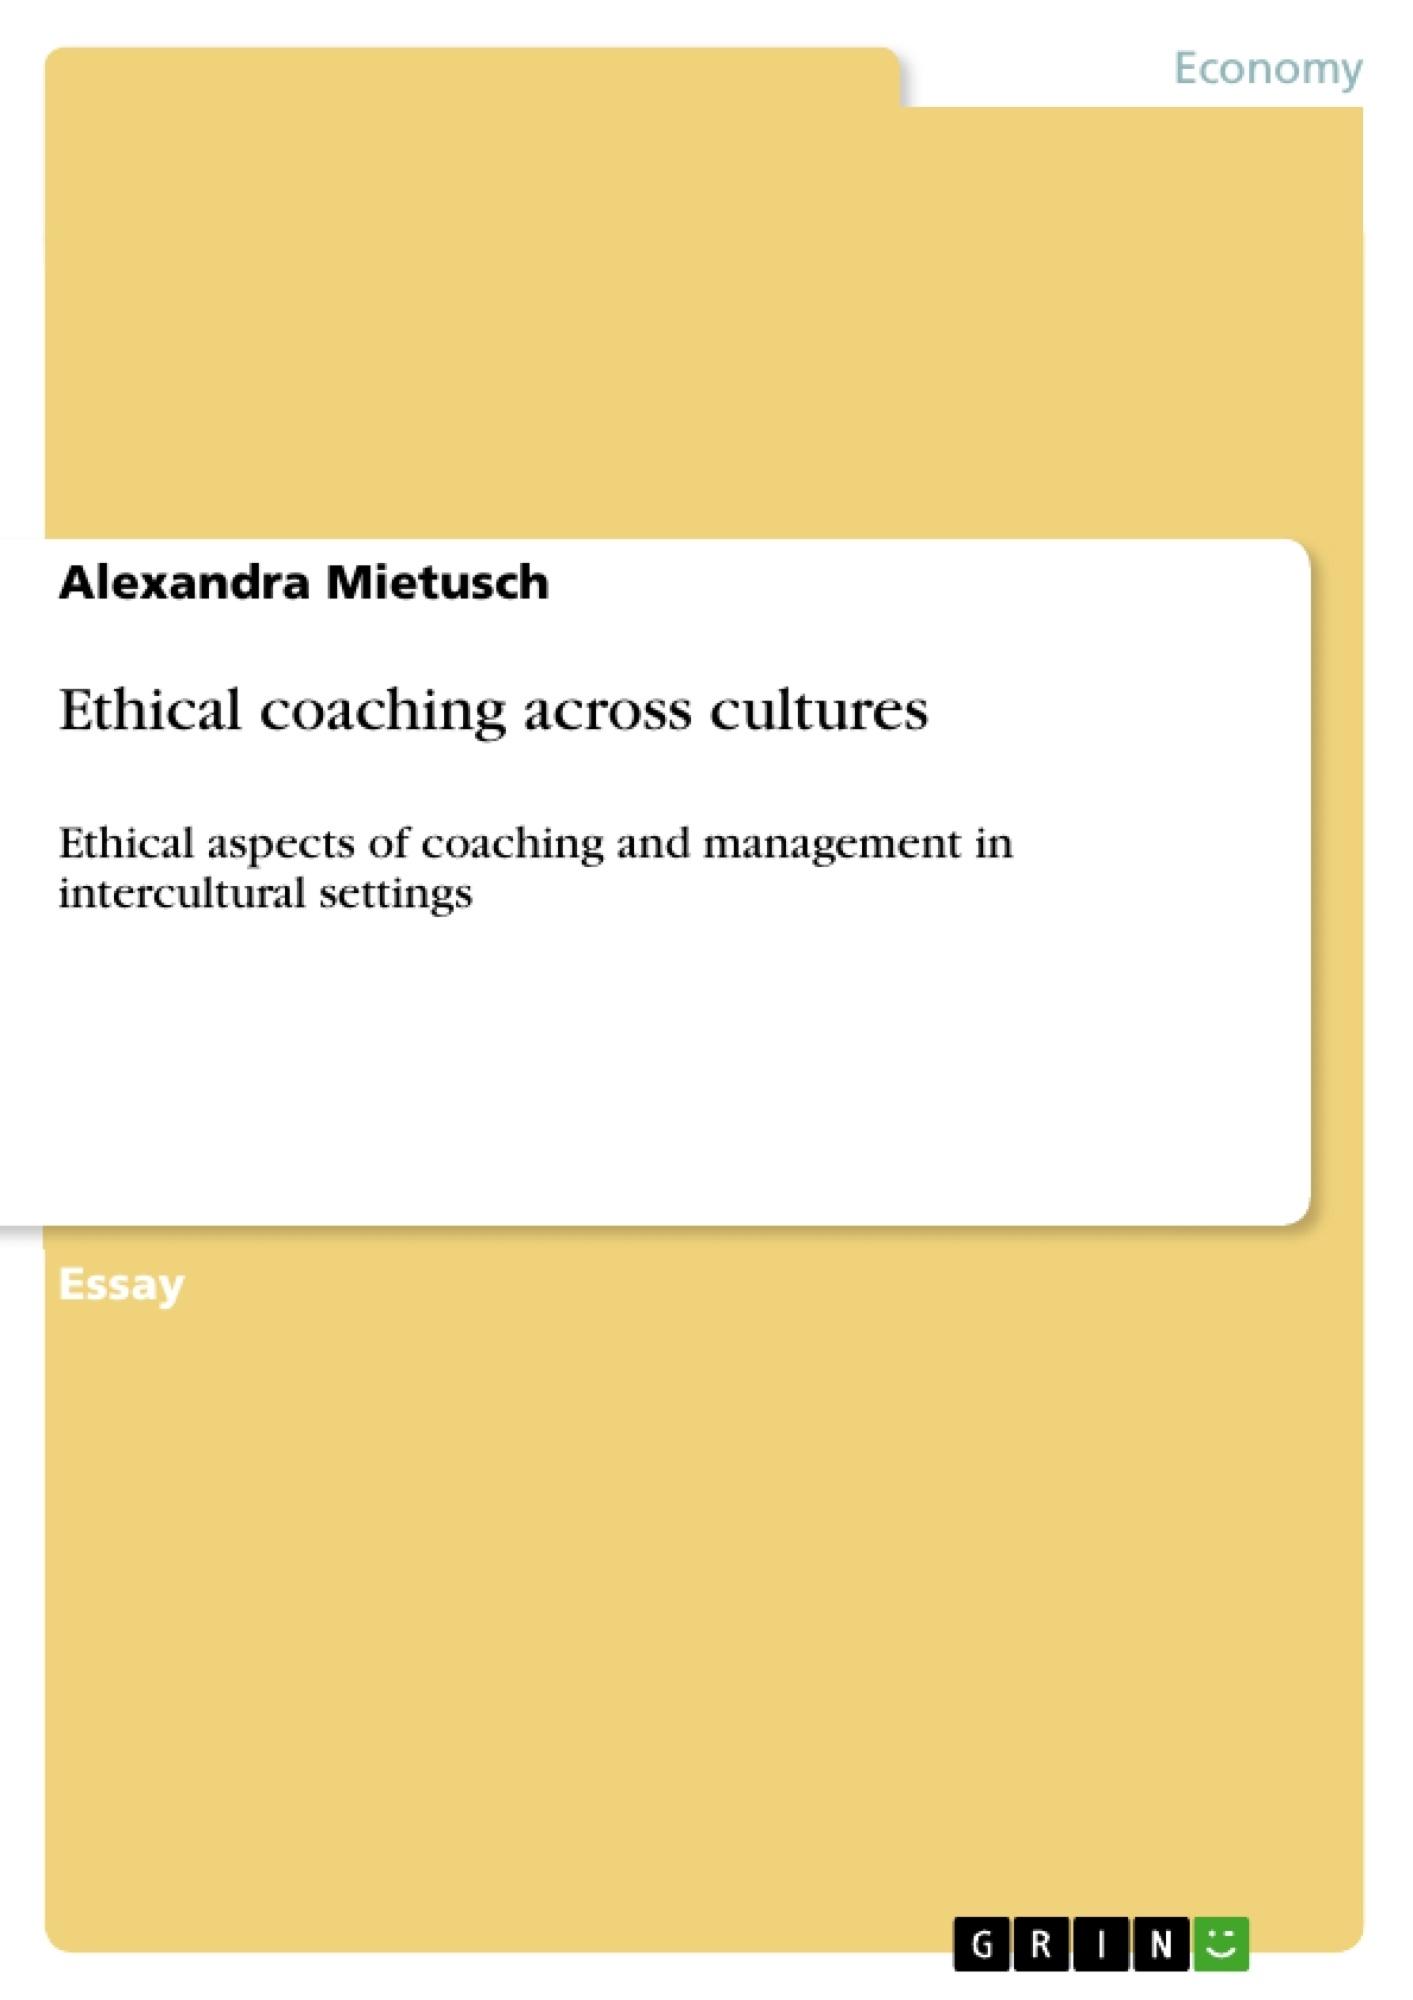 Bachelor thesis coaching